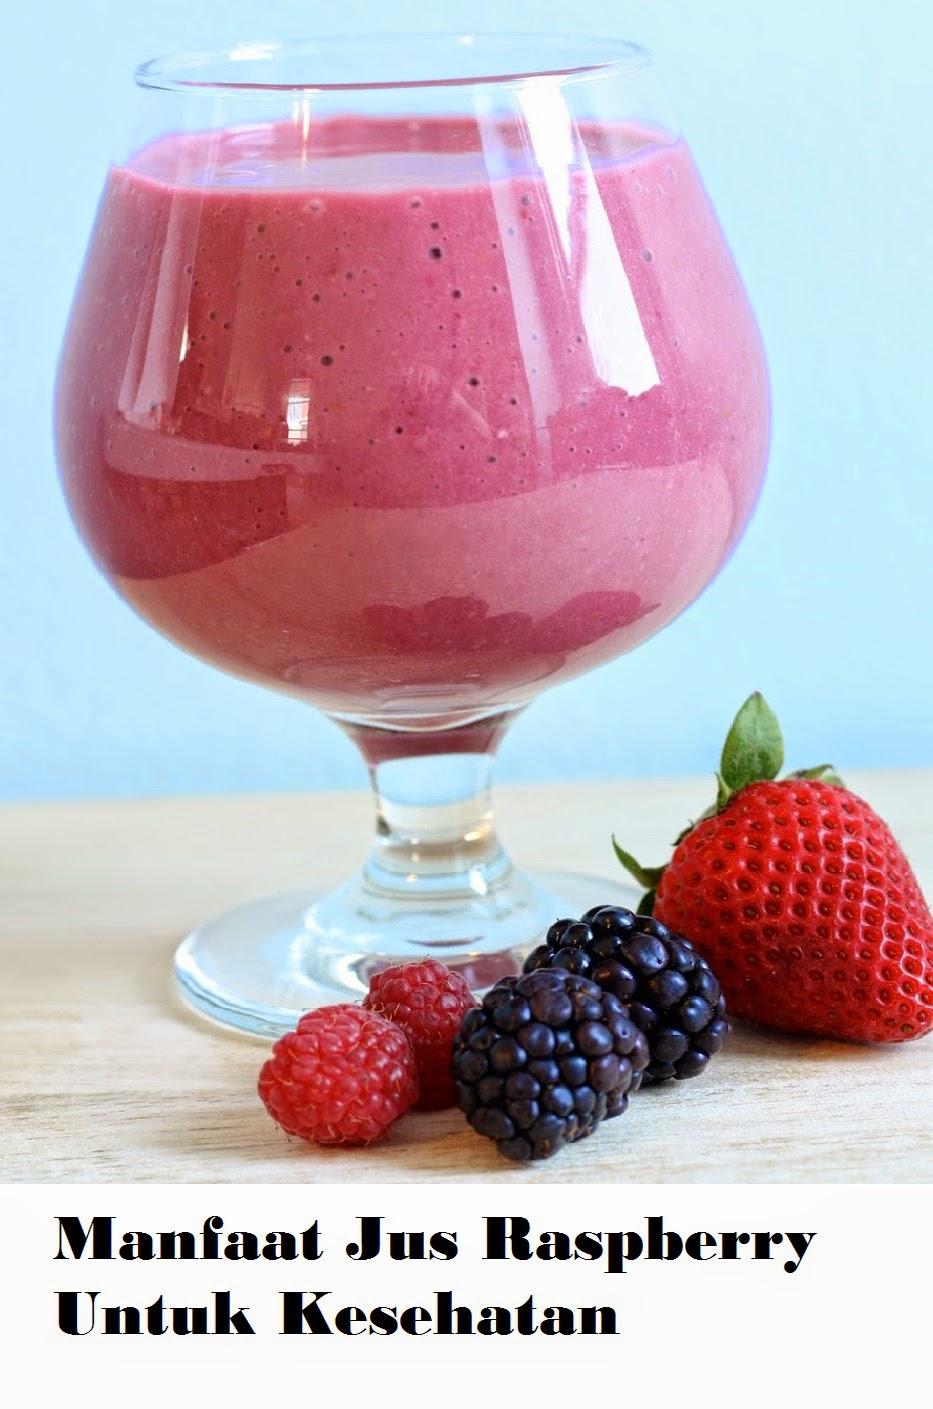 Manfaat Jus Raspberry Untuk Kesehatan